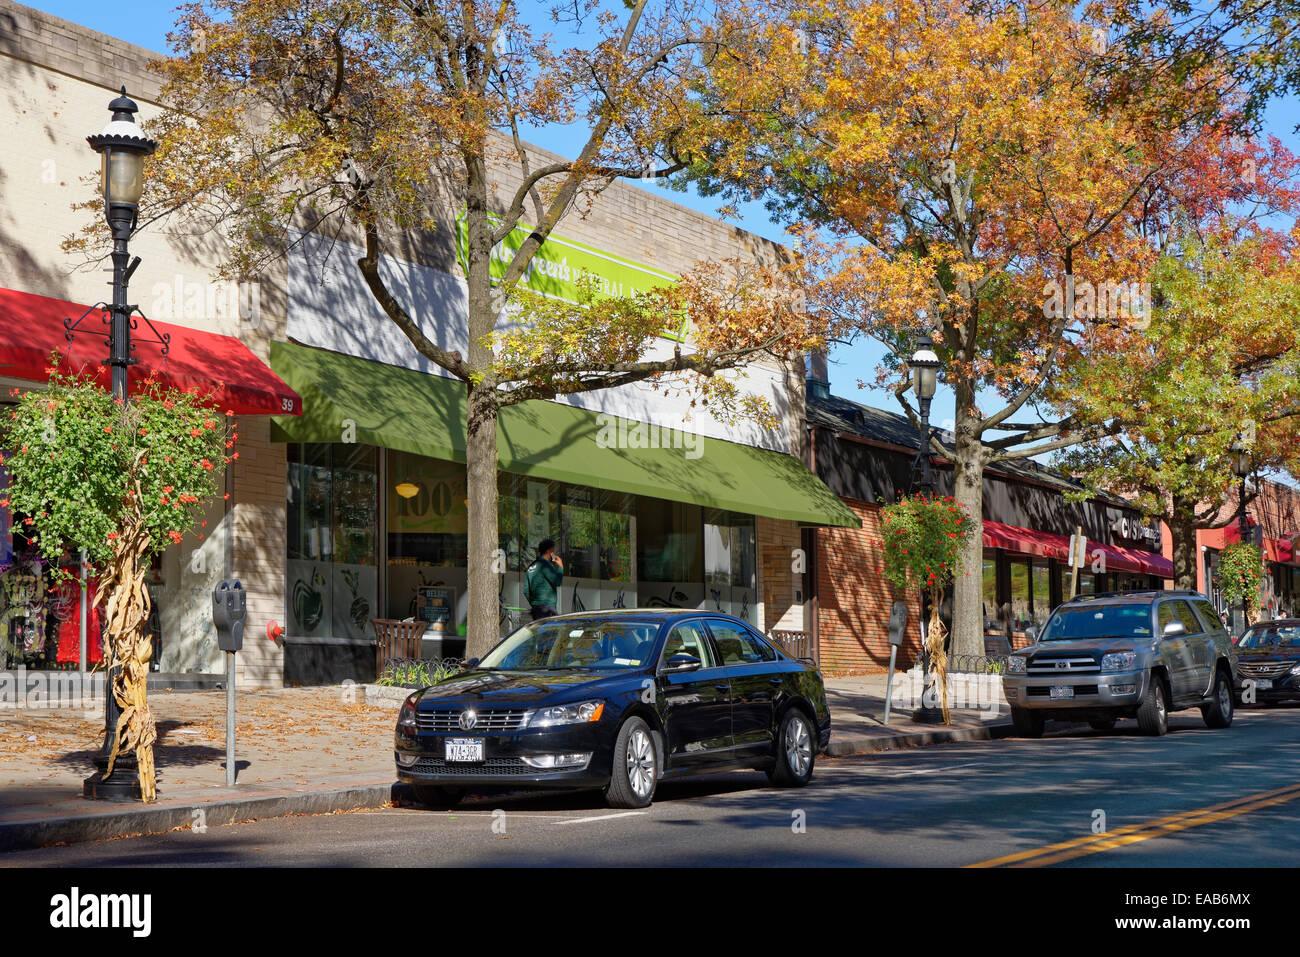 Downtown Tarrytown, New York, USA Stock Photo